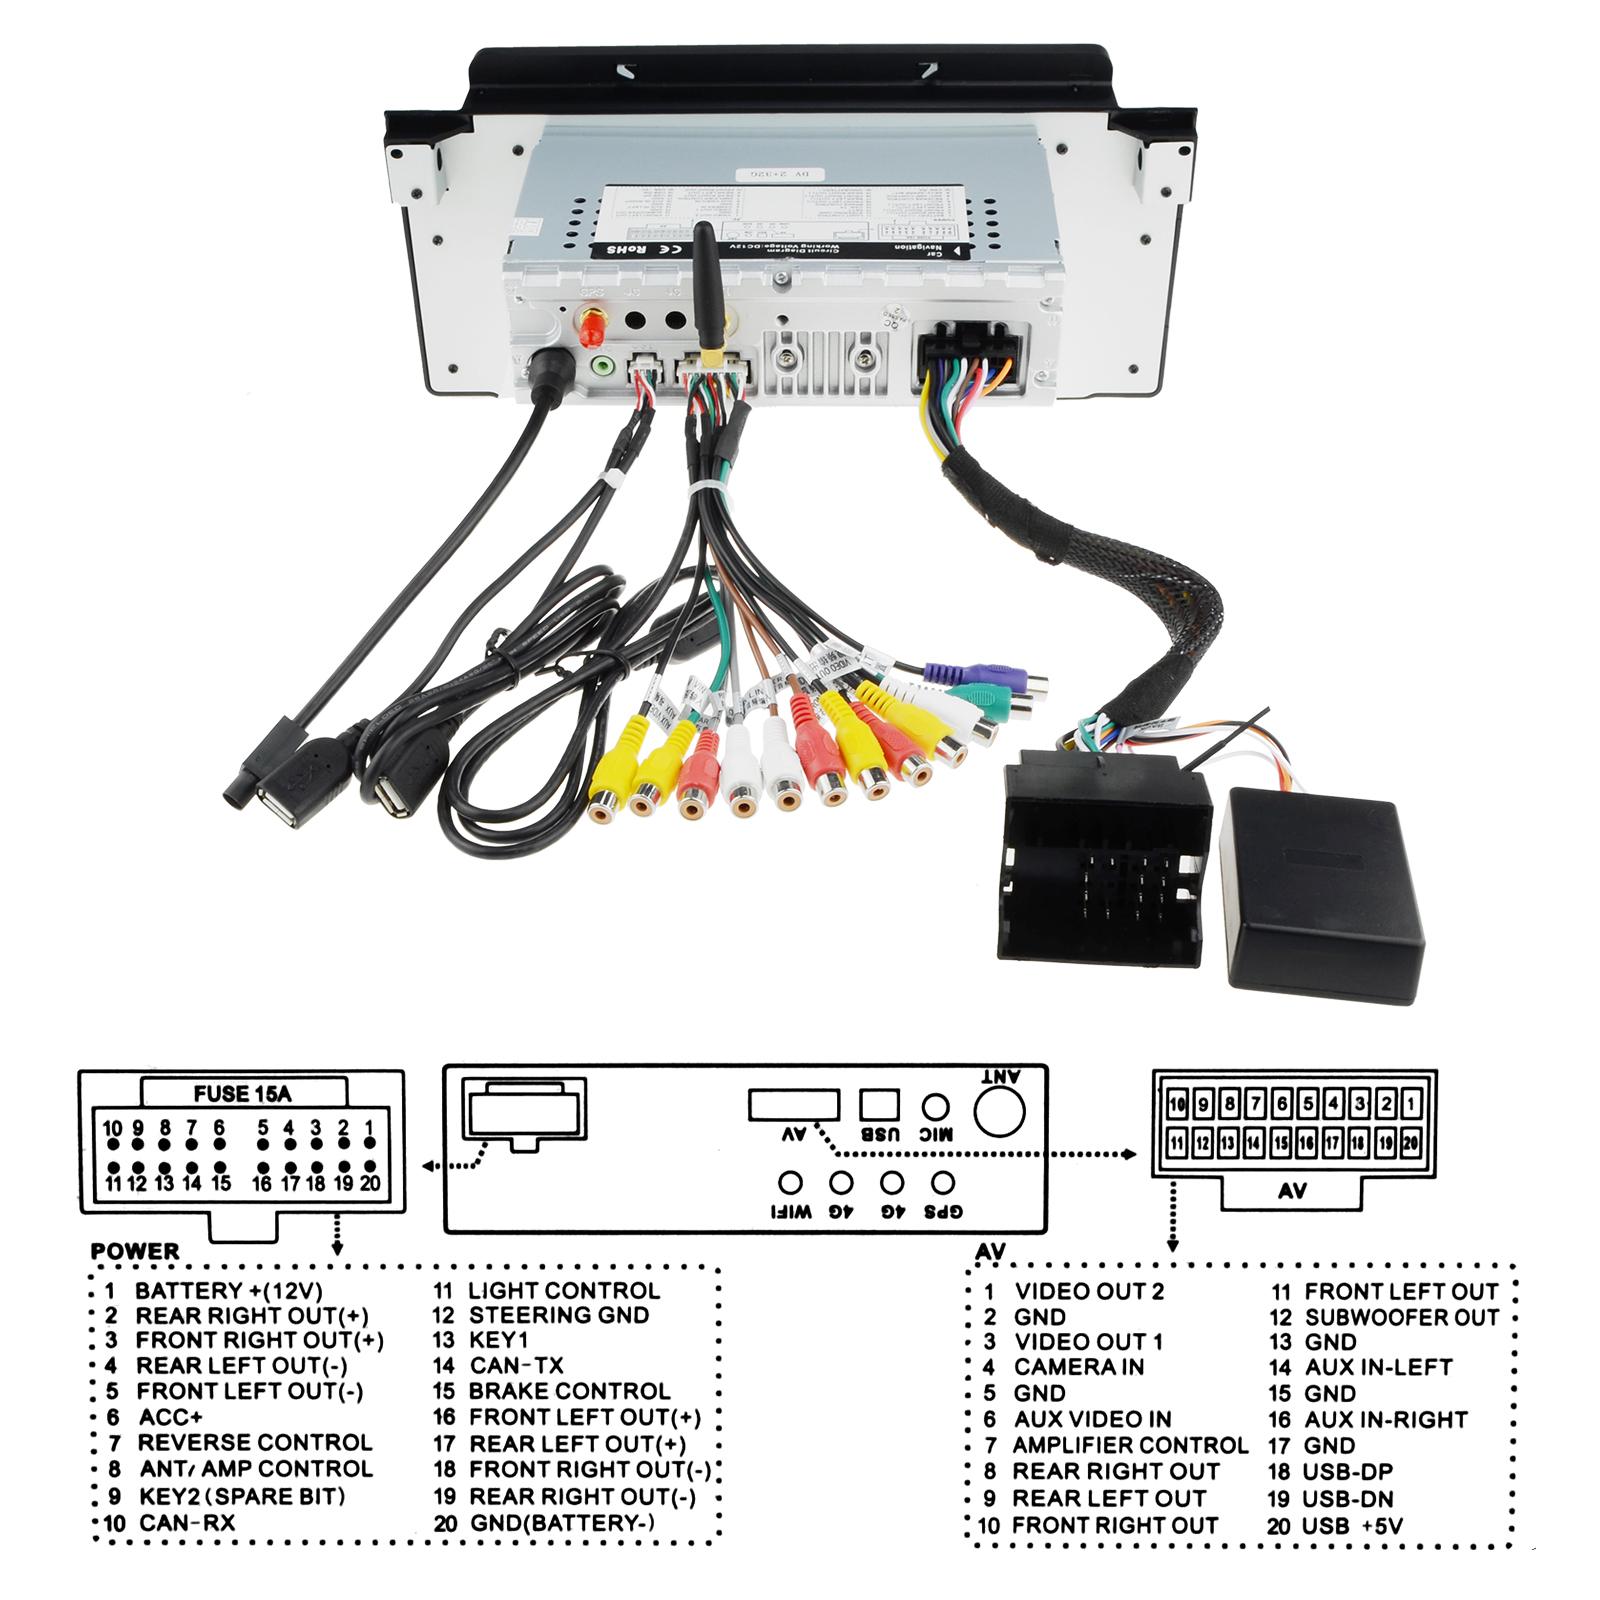 9android 81 Hd Car Radio Sat Nav Gps Dab Wifi Canbus Bluetooth E39 Factory Amp Wiring Bmw X5 E53